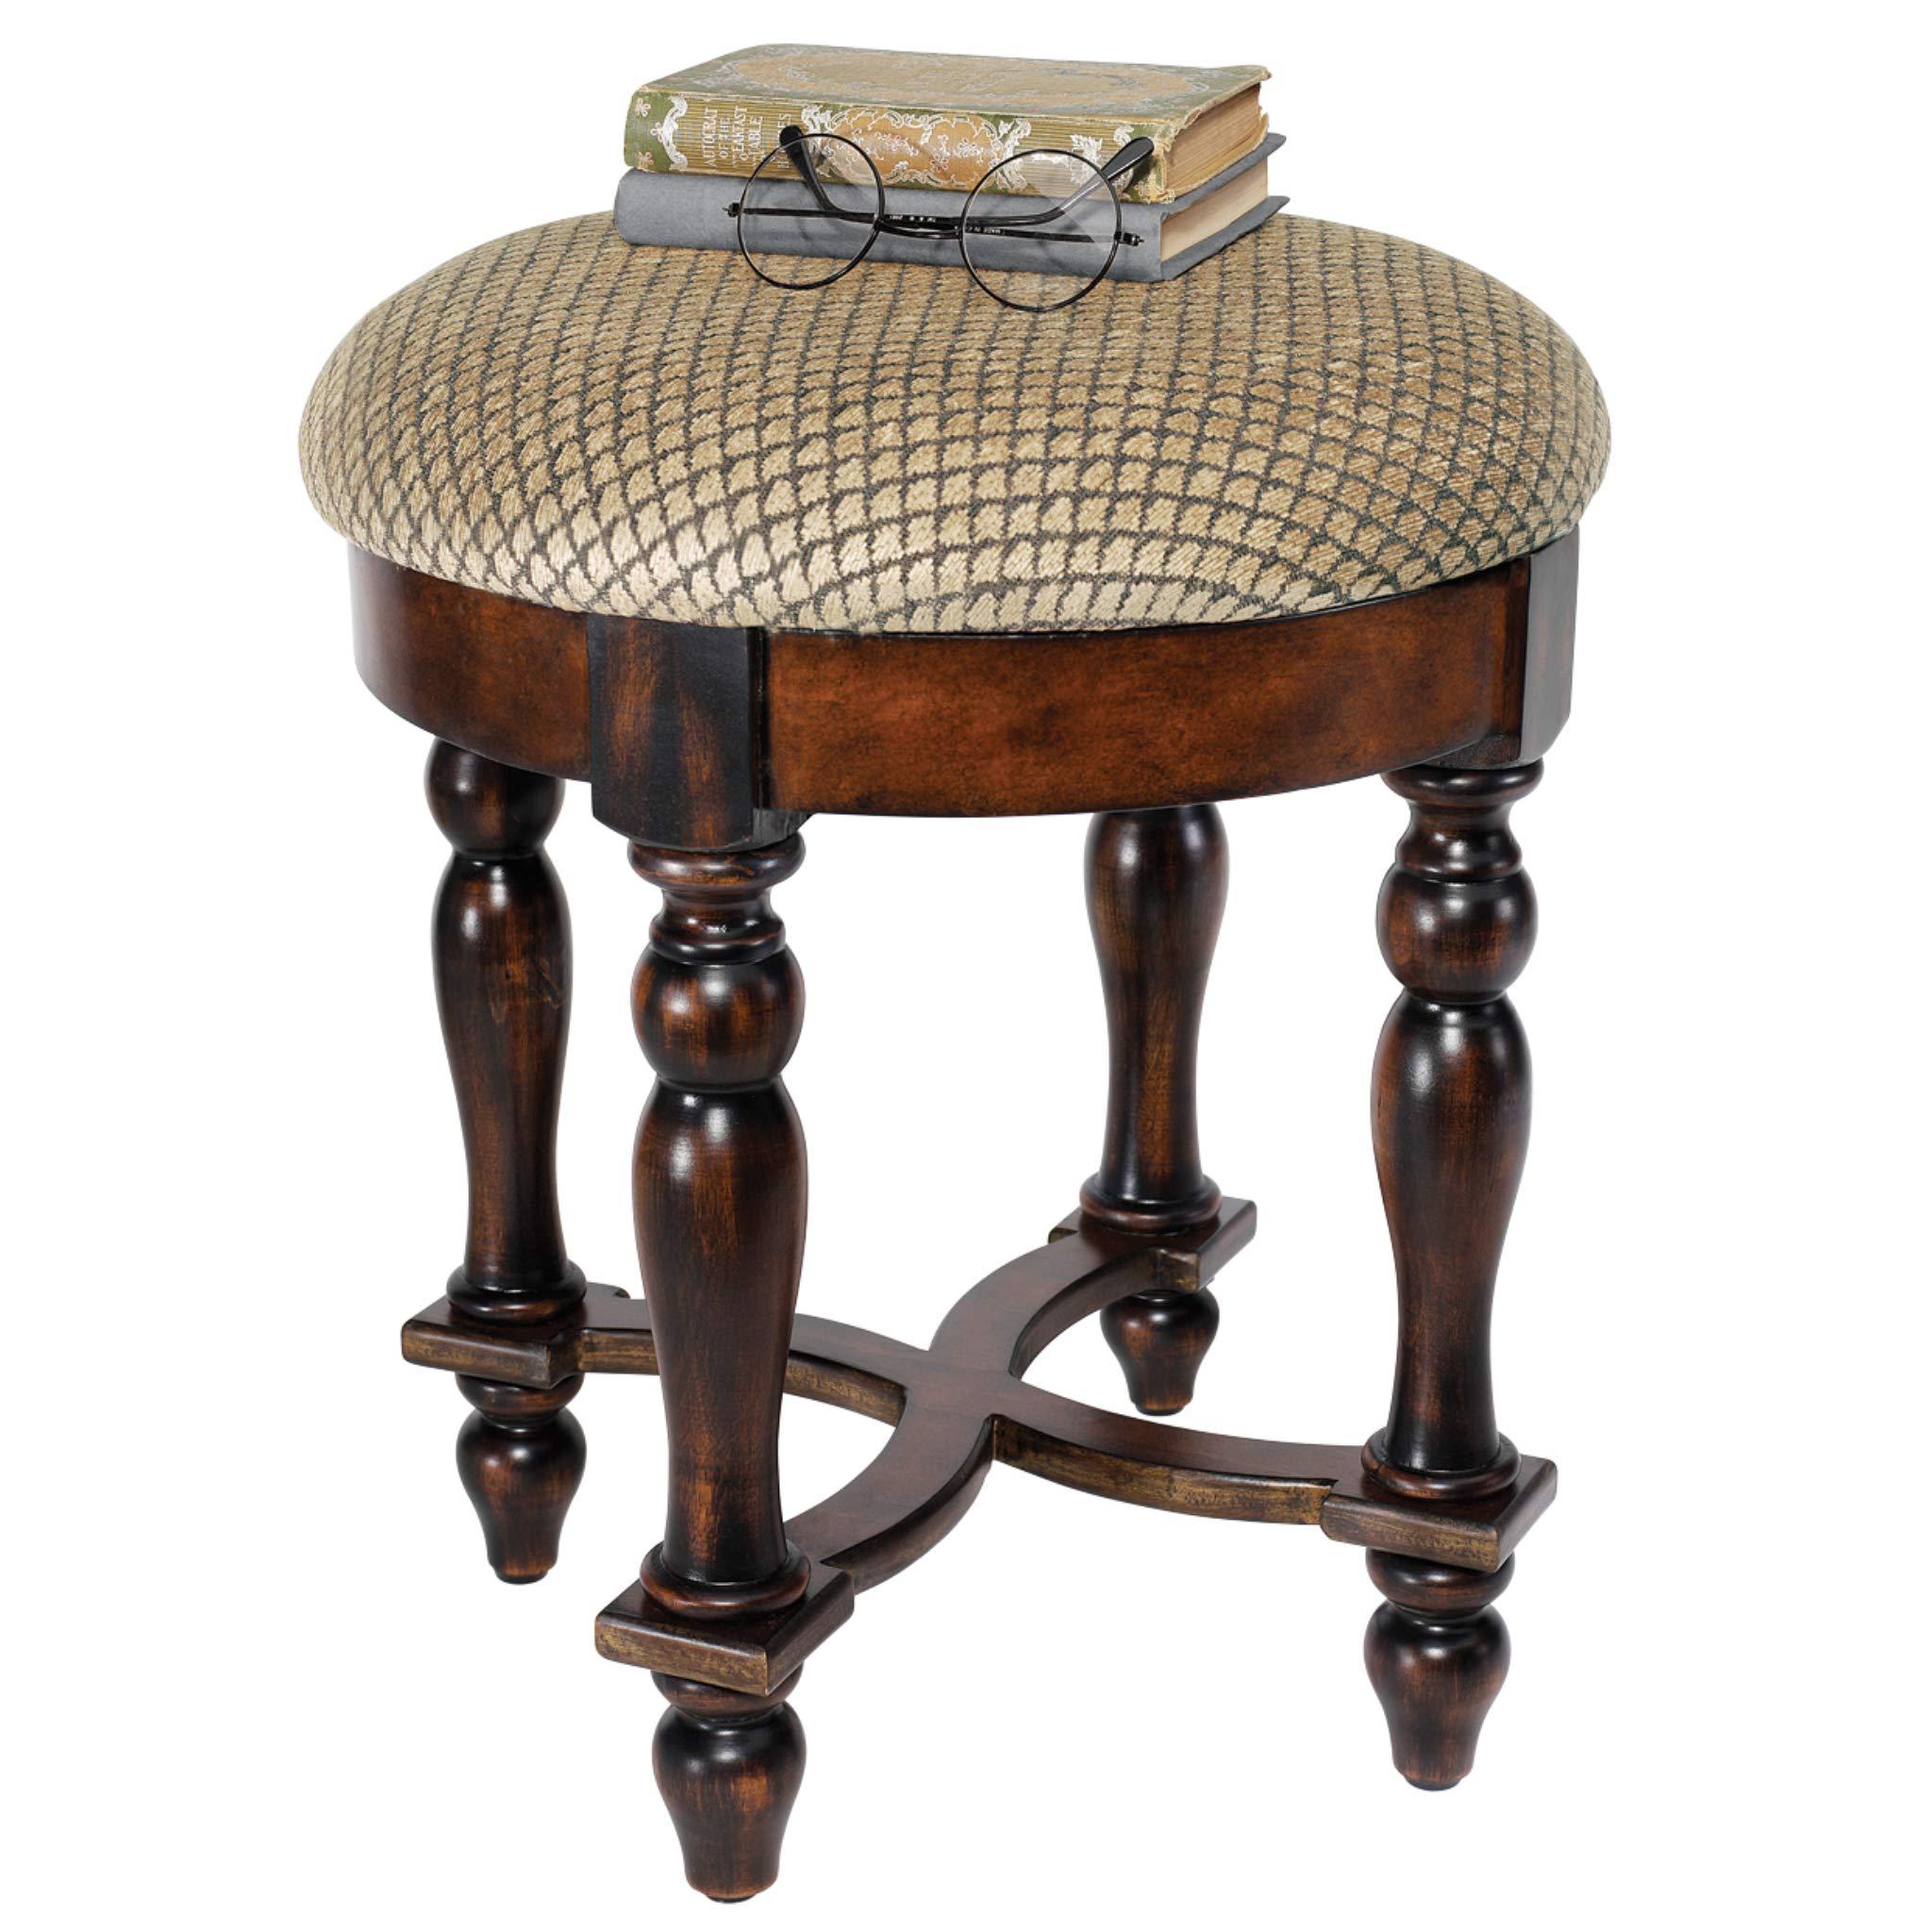 Design Toscano Grand Duchess Vanity Stool, 17 Inch, Hardwood, Walnut